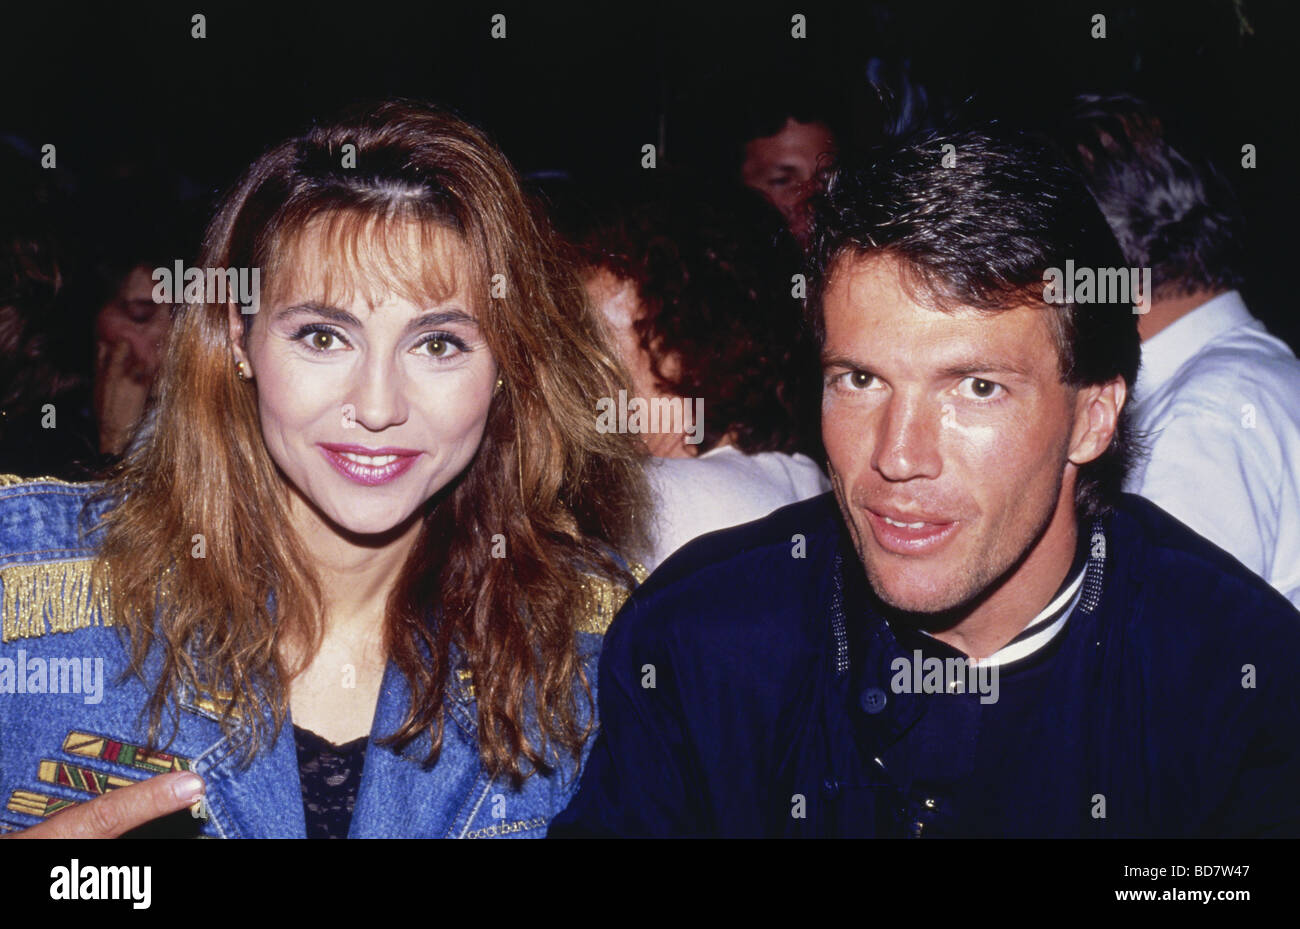 Matthäus, Lothar  * 21.3.1961, German athlete (soccer/football), half length with his second wife Lolita Morena, - Stock Image